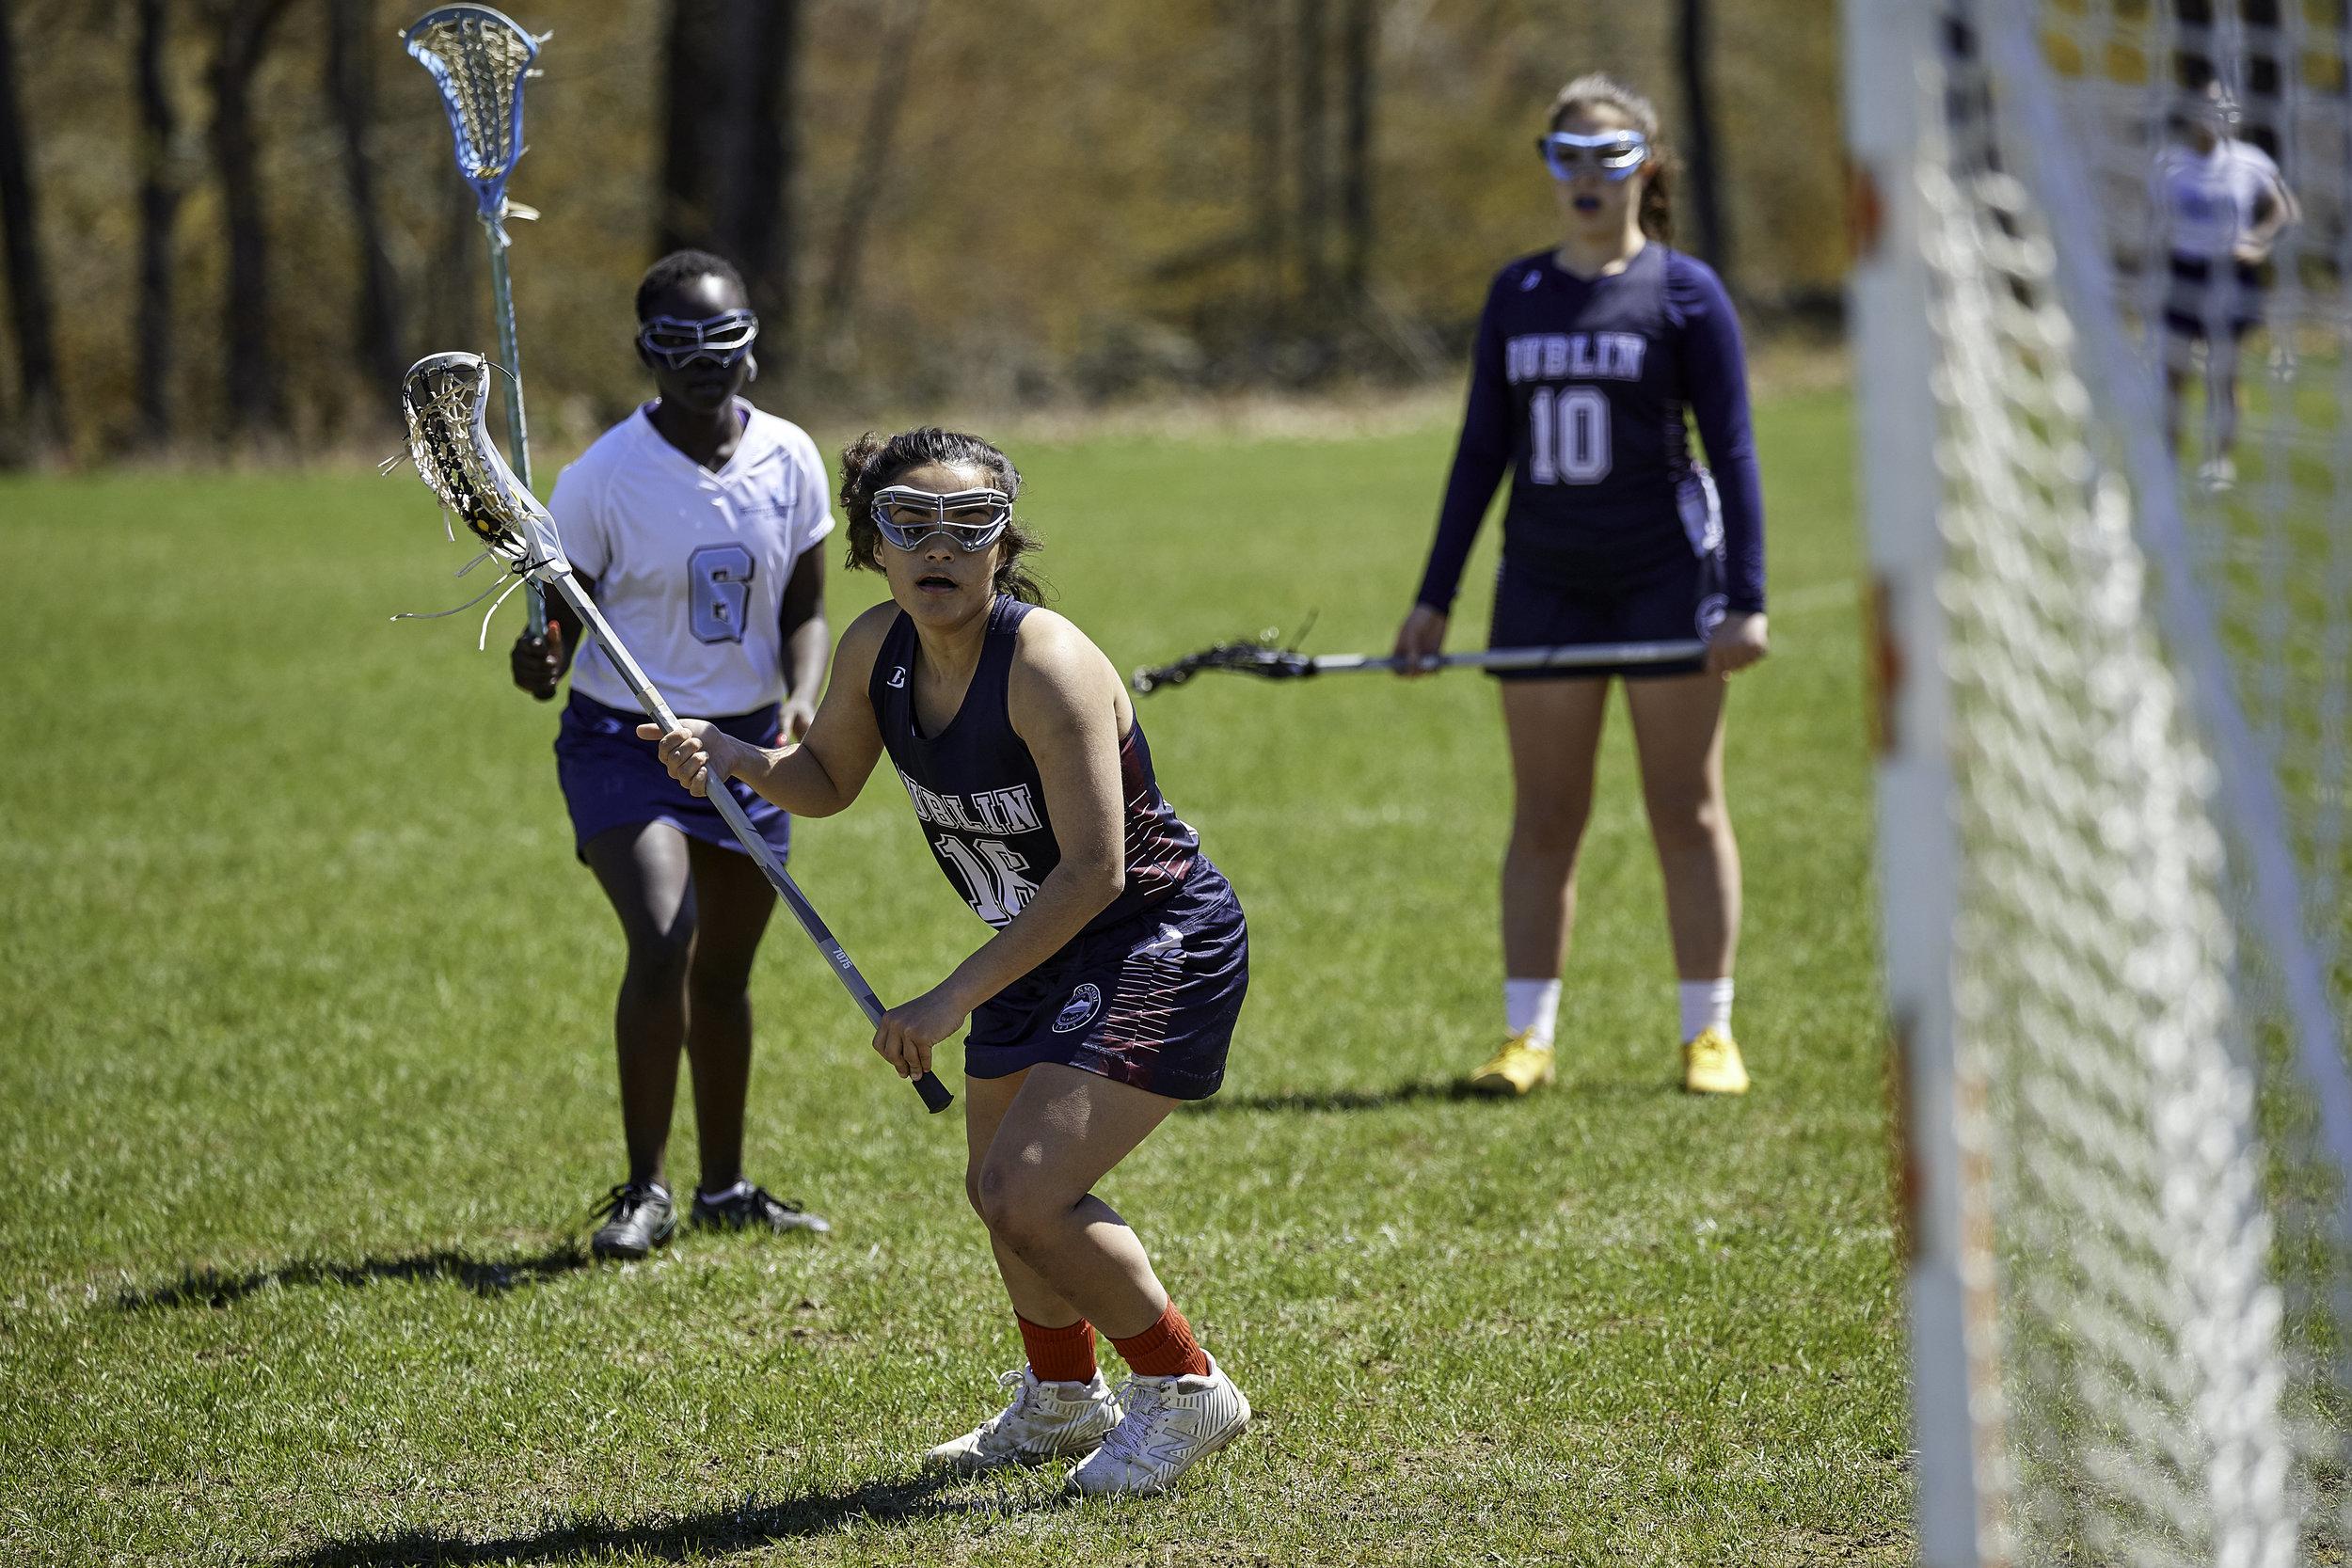 Girls Lacrosse vs. Stoneleigh Burnham School - May 11, 2019 - May 10, 2019193160.jpg